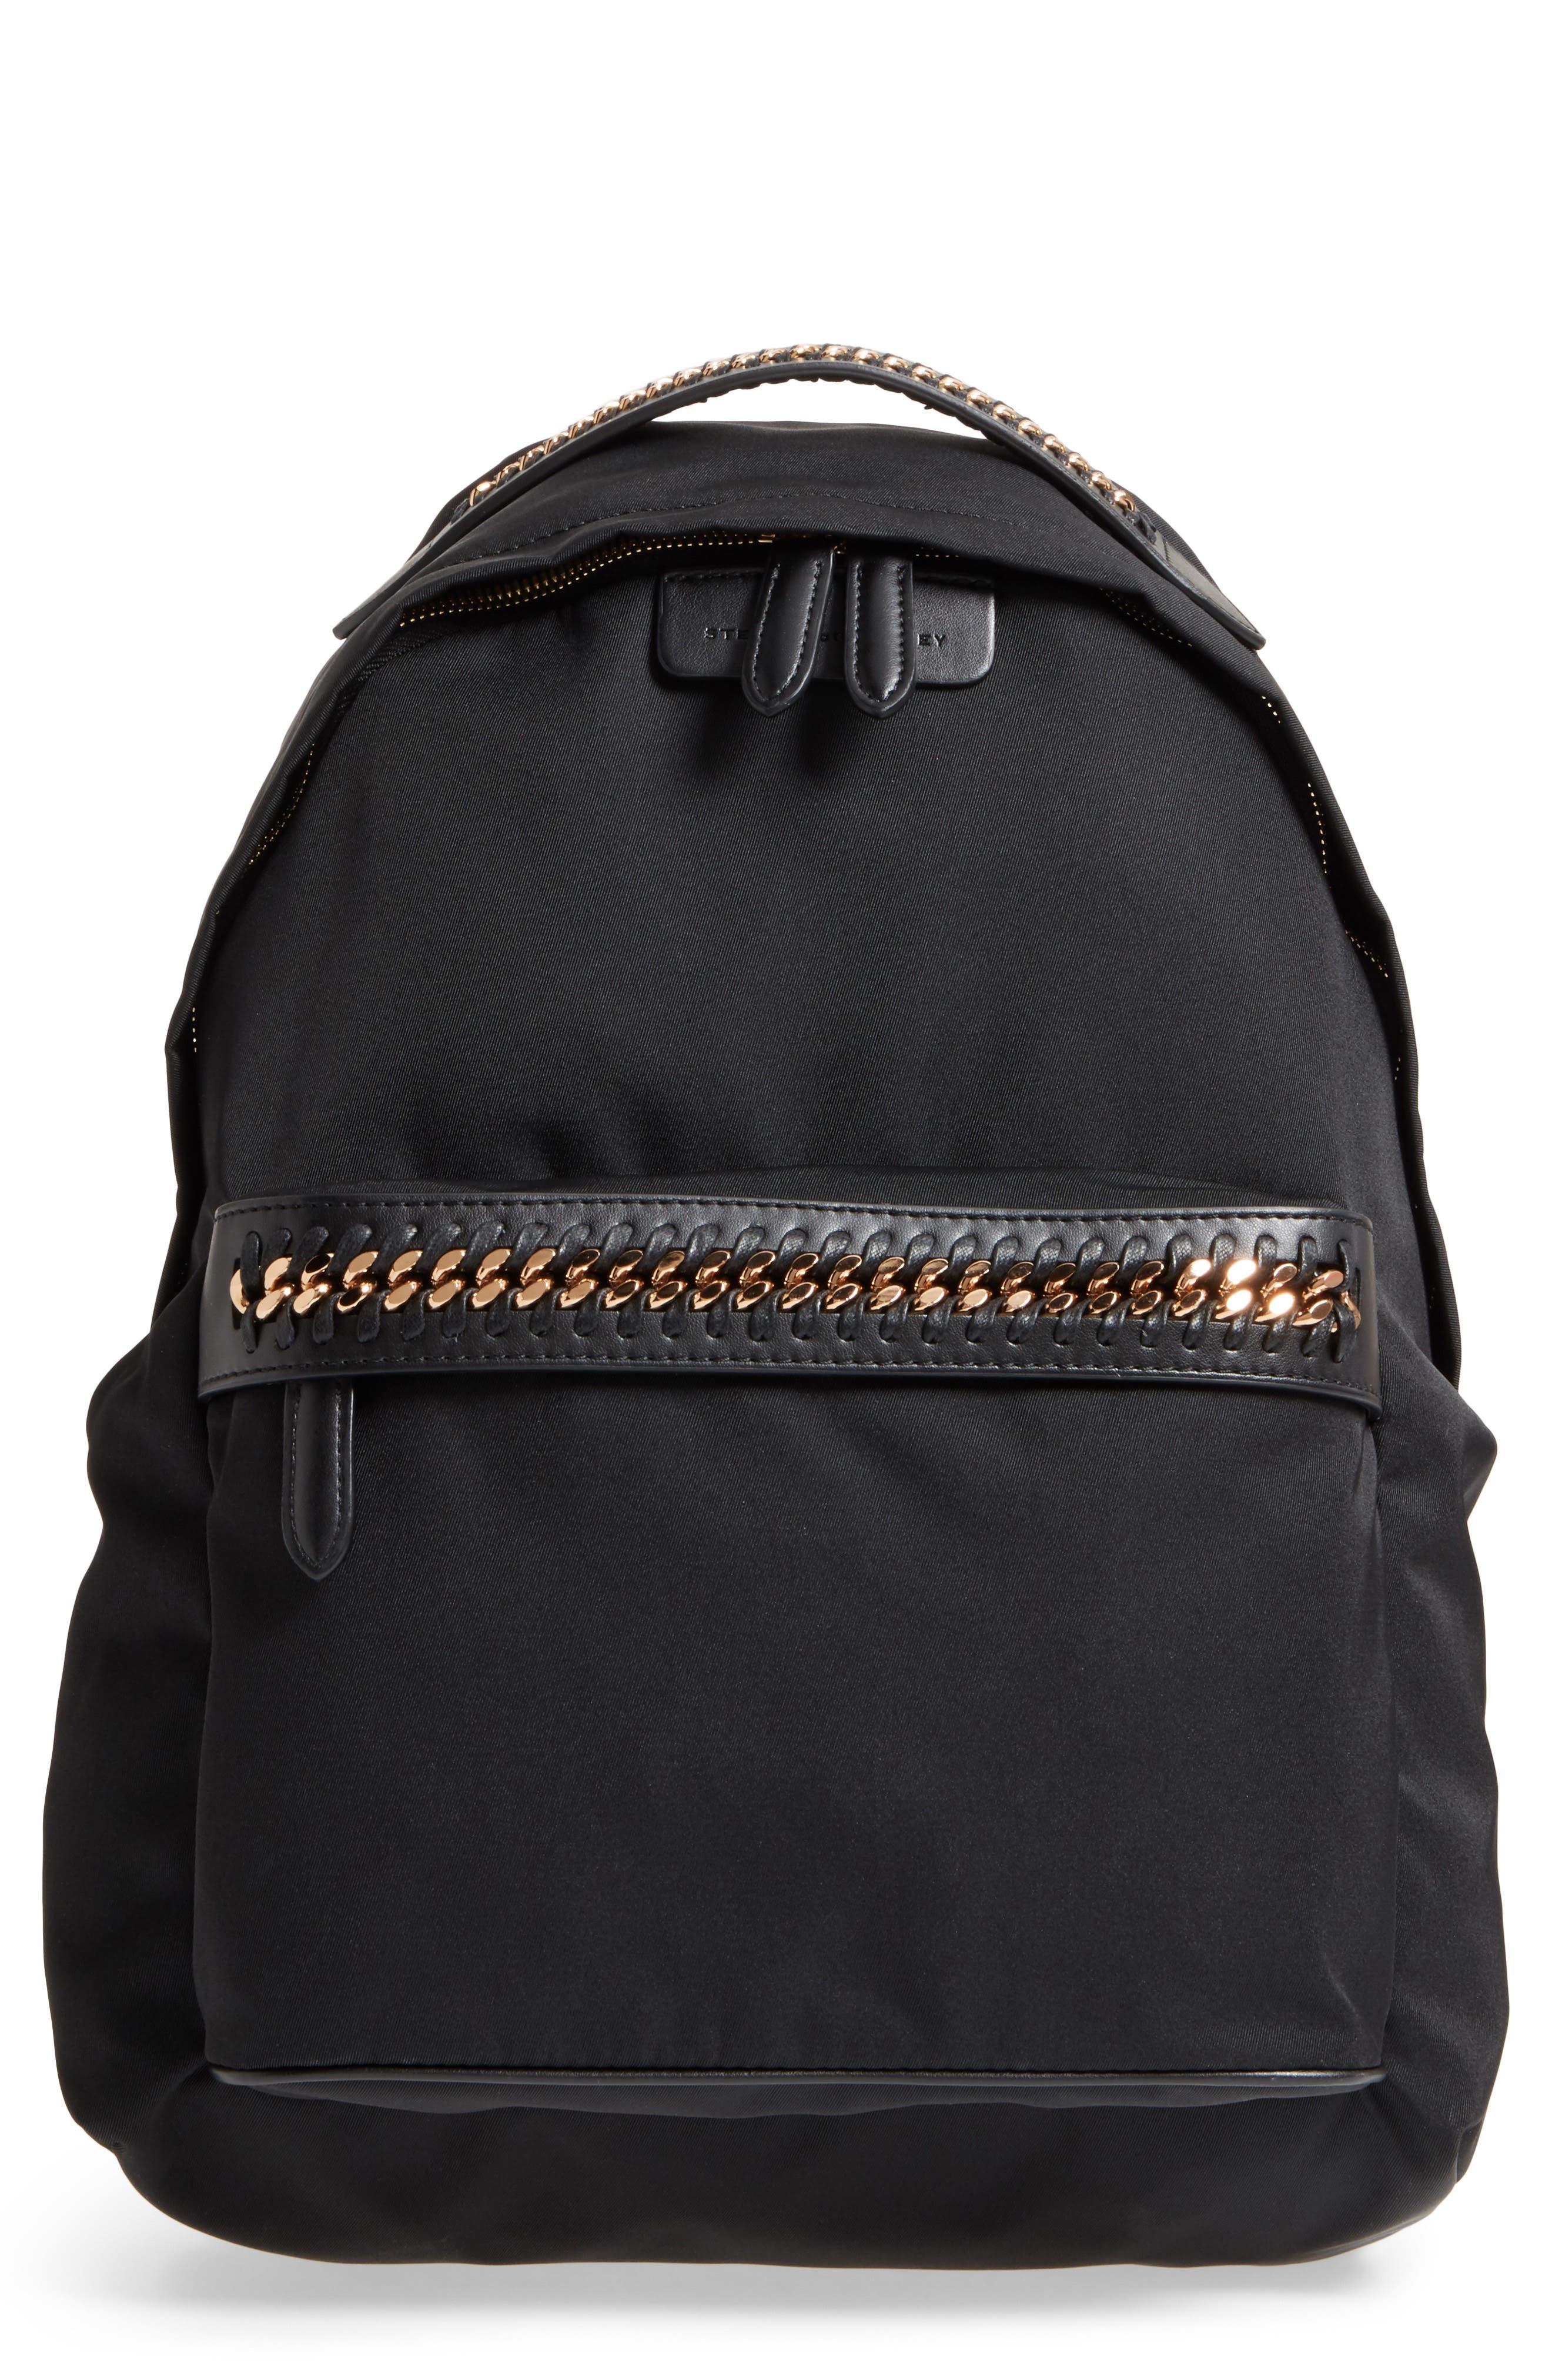 Alternate Image 1 Selected - Stella McCartney Falabella Nylon Backpack